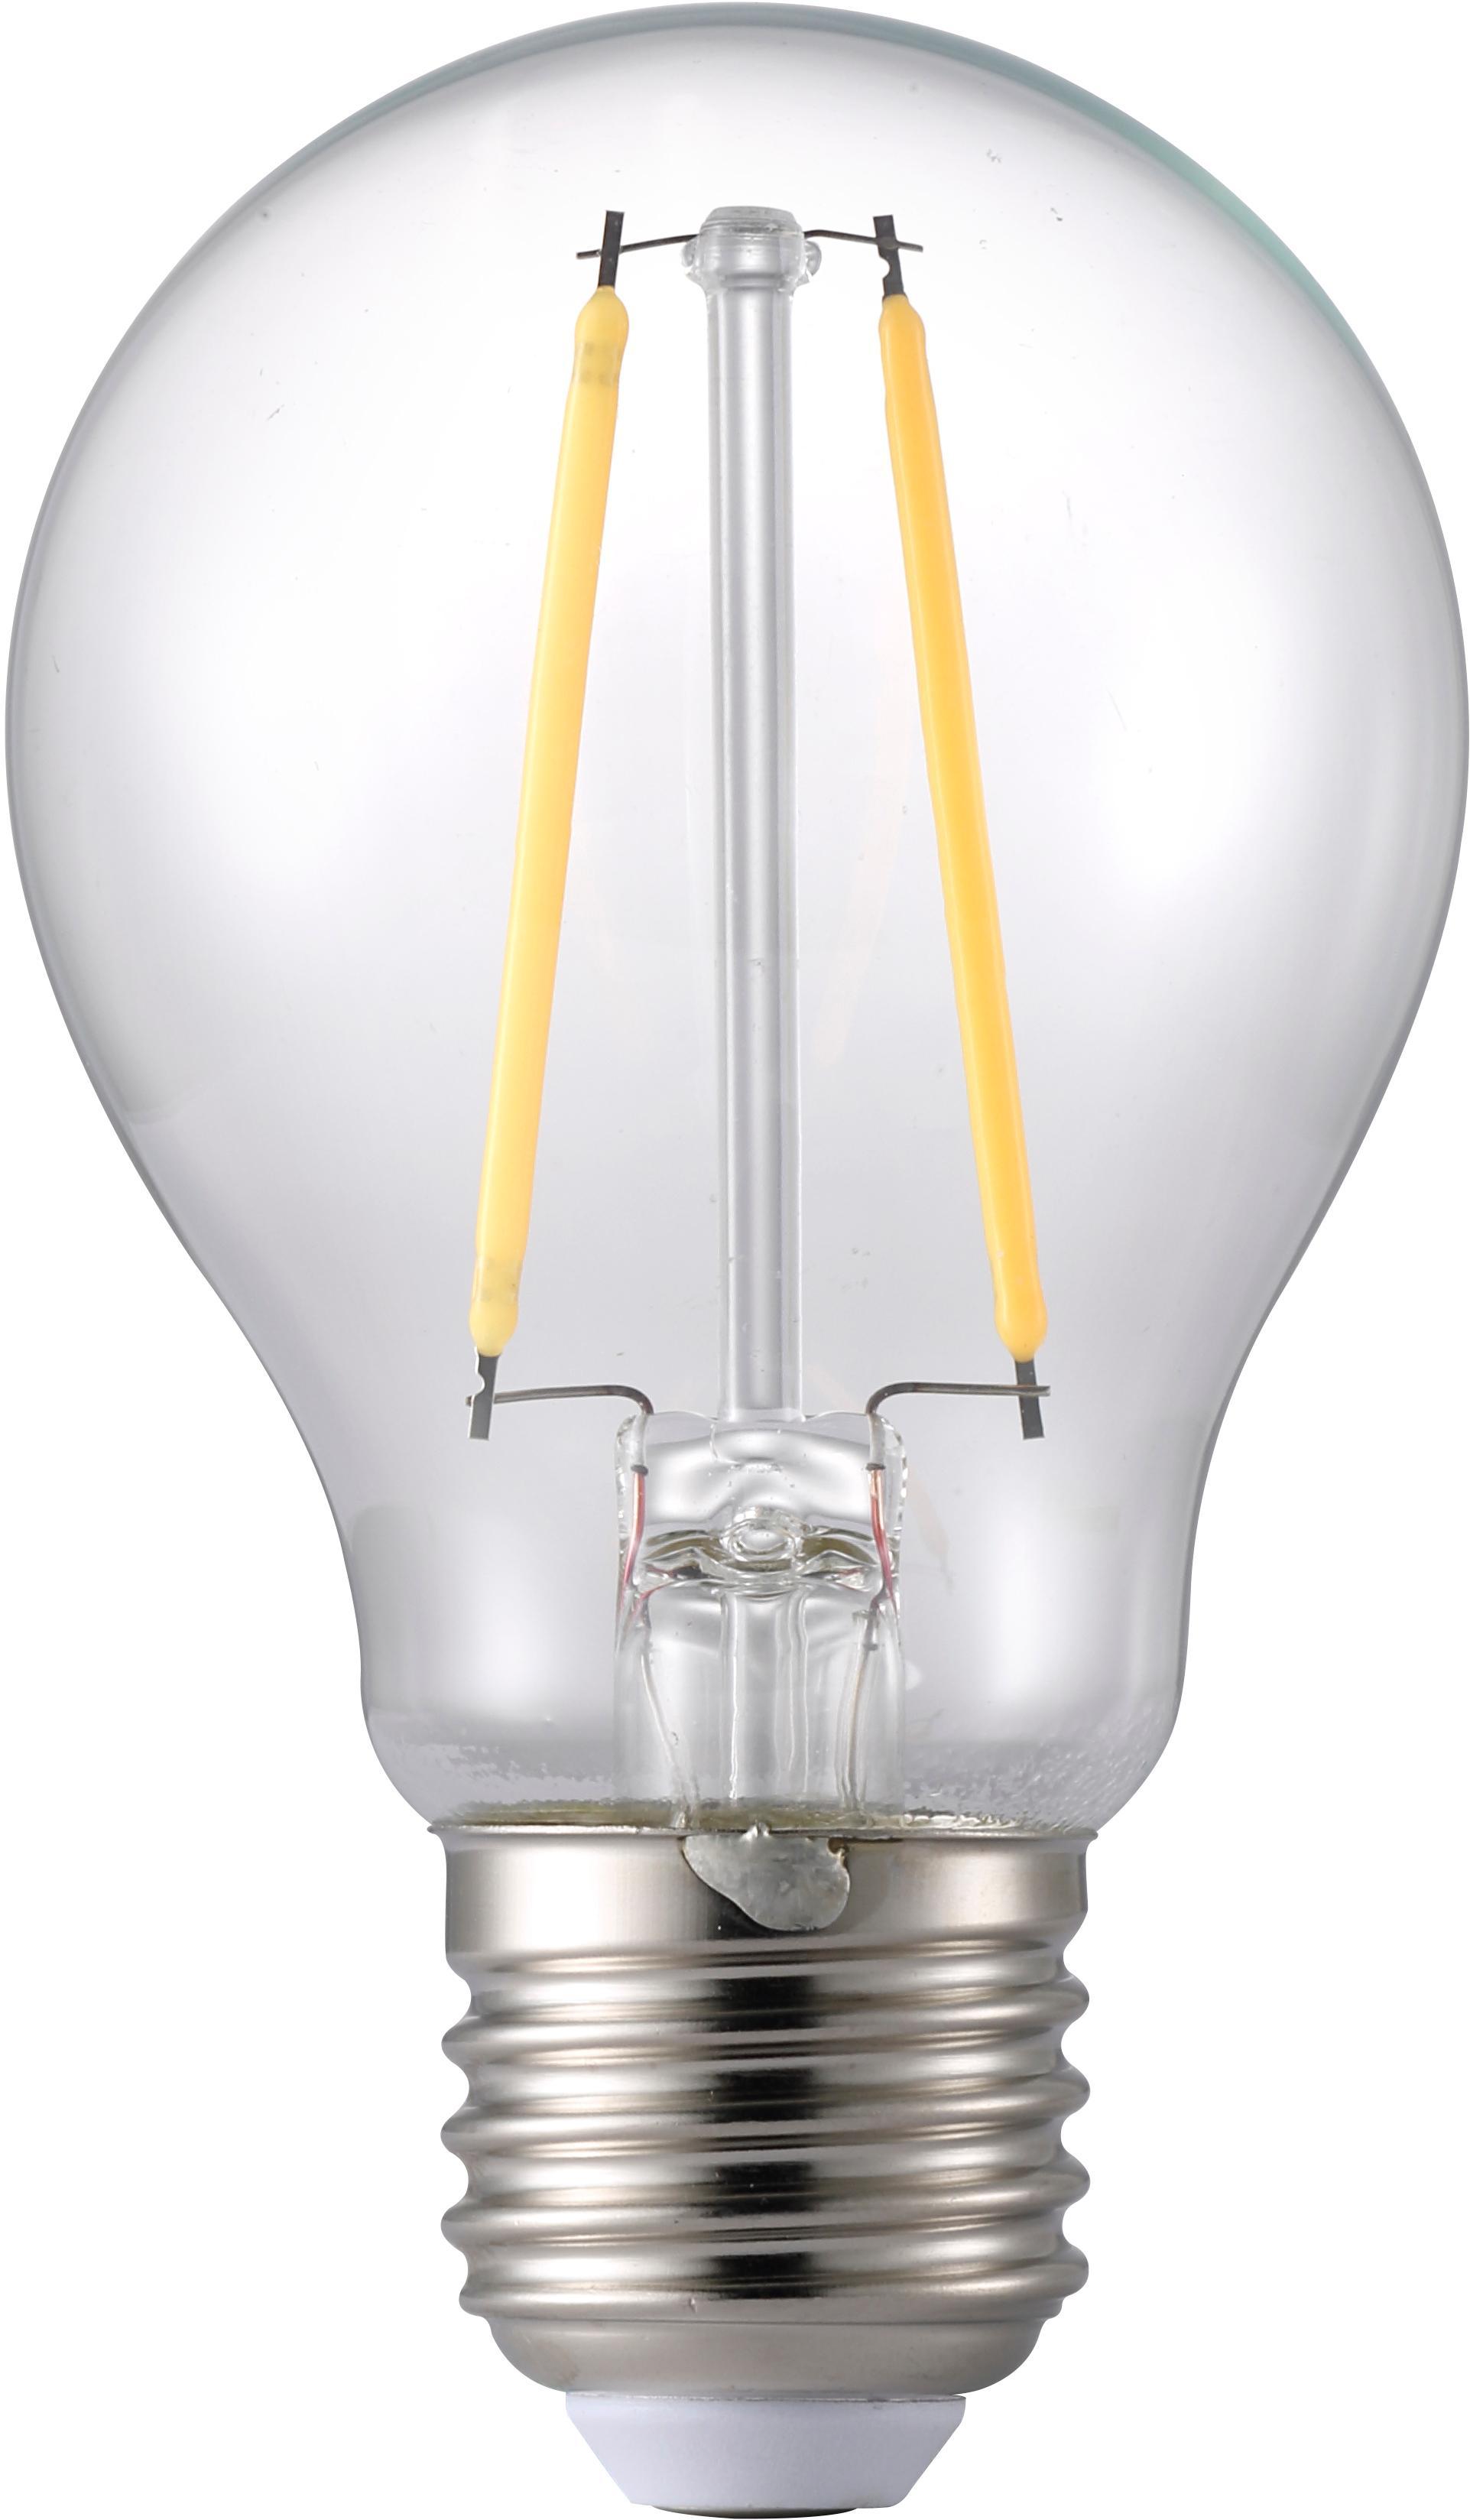 LED Leuchtmittel Humiel (E27/4.6W), Leuchtmittelschirm: Glas, Leuchtmittelfassung: Aluminium, Transparent, Ø 6 x H 10 cm